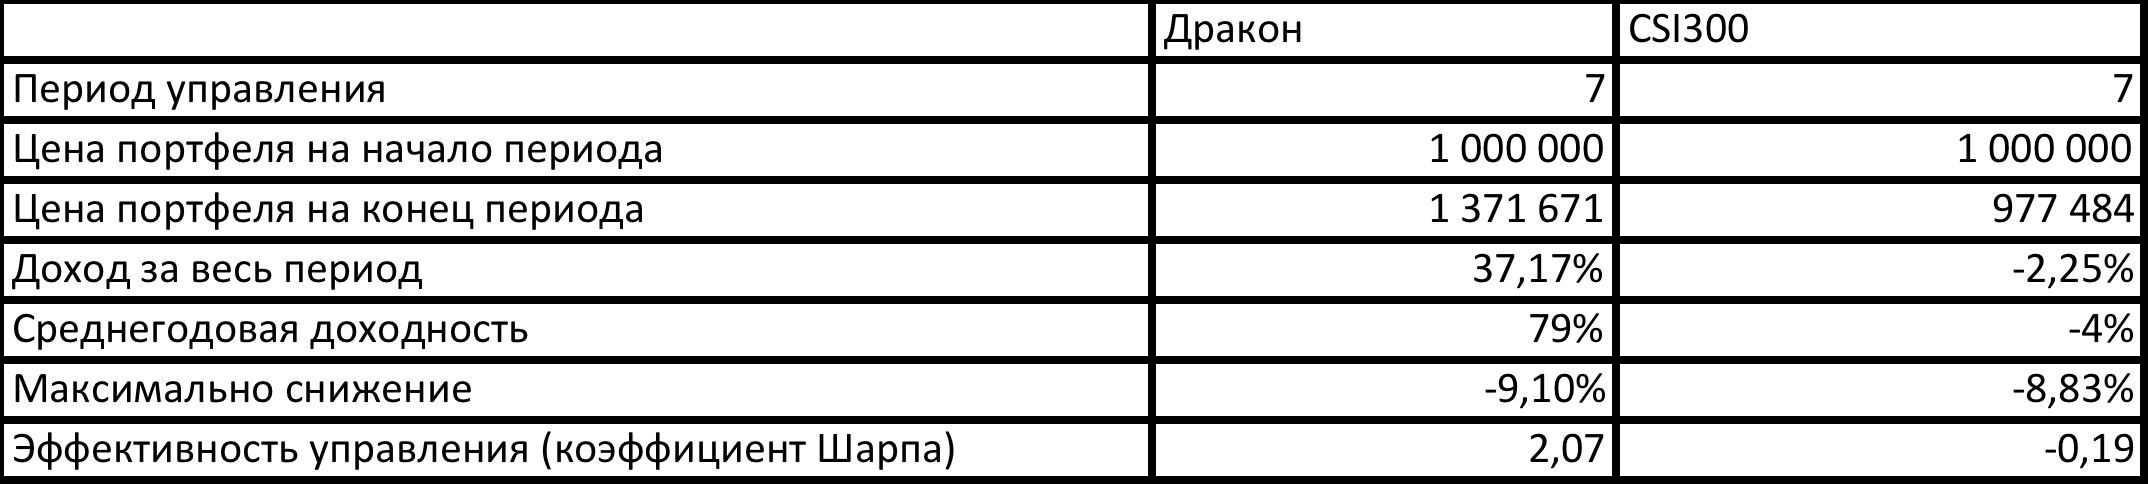 https://files.comon.ru/4qc6fln6mhijhp1sndtrtogkc25vd152937xaztpcbjmk4jjch.png